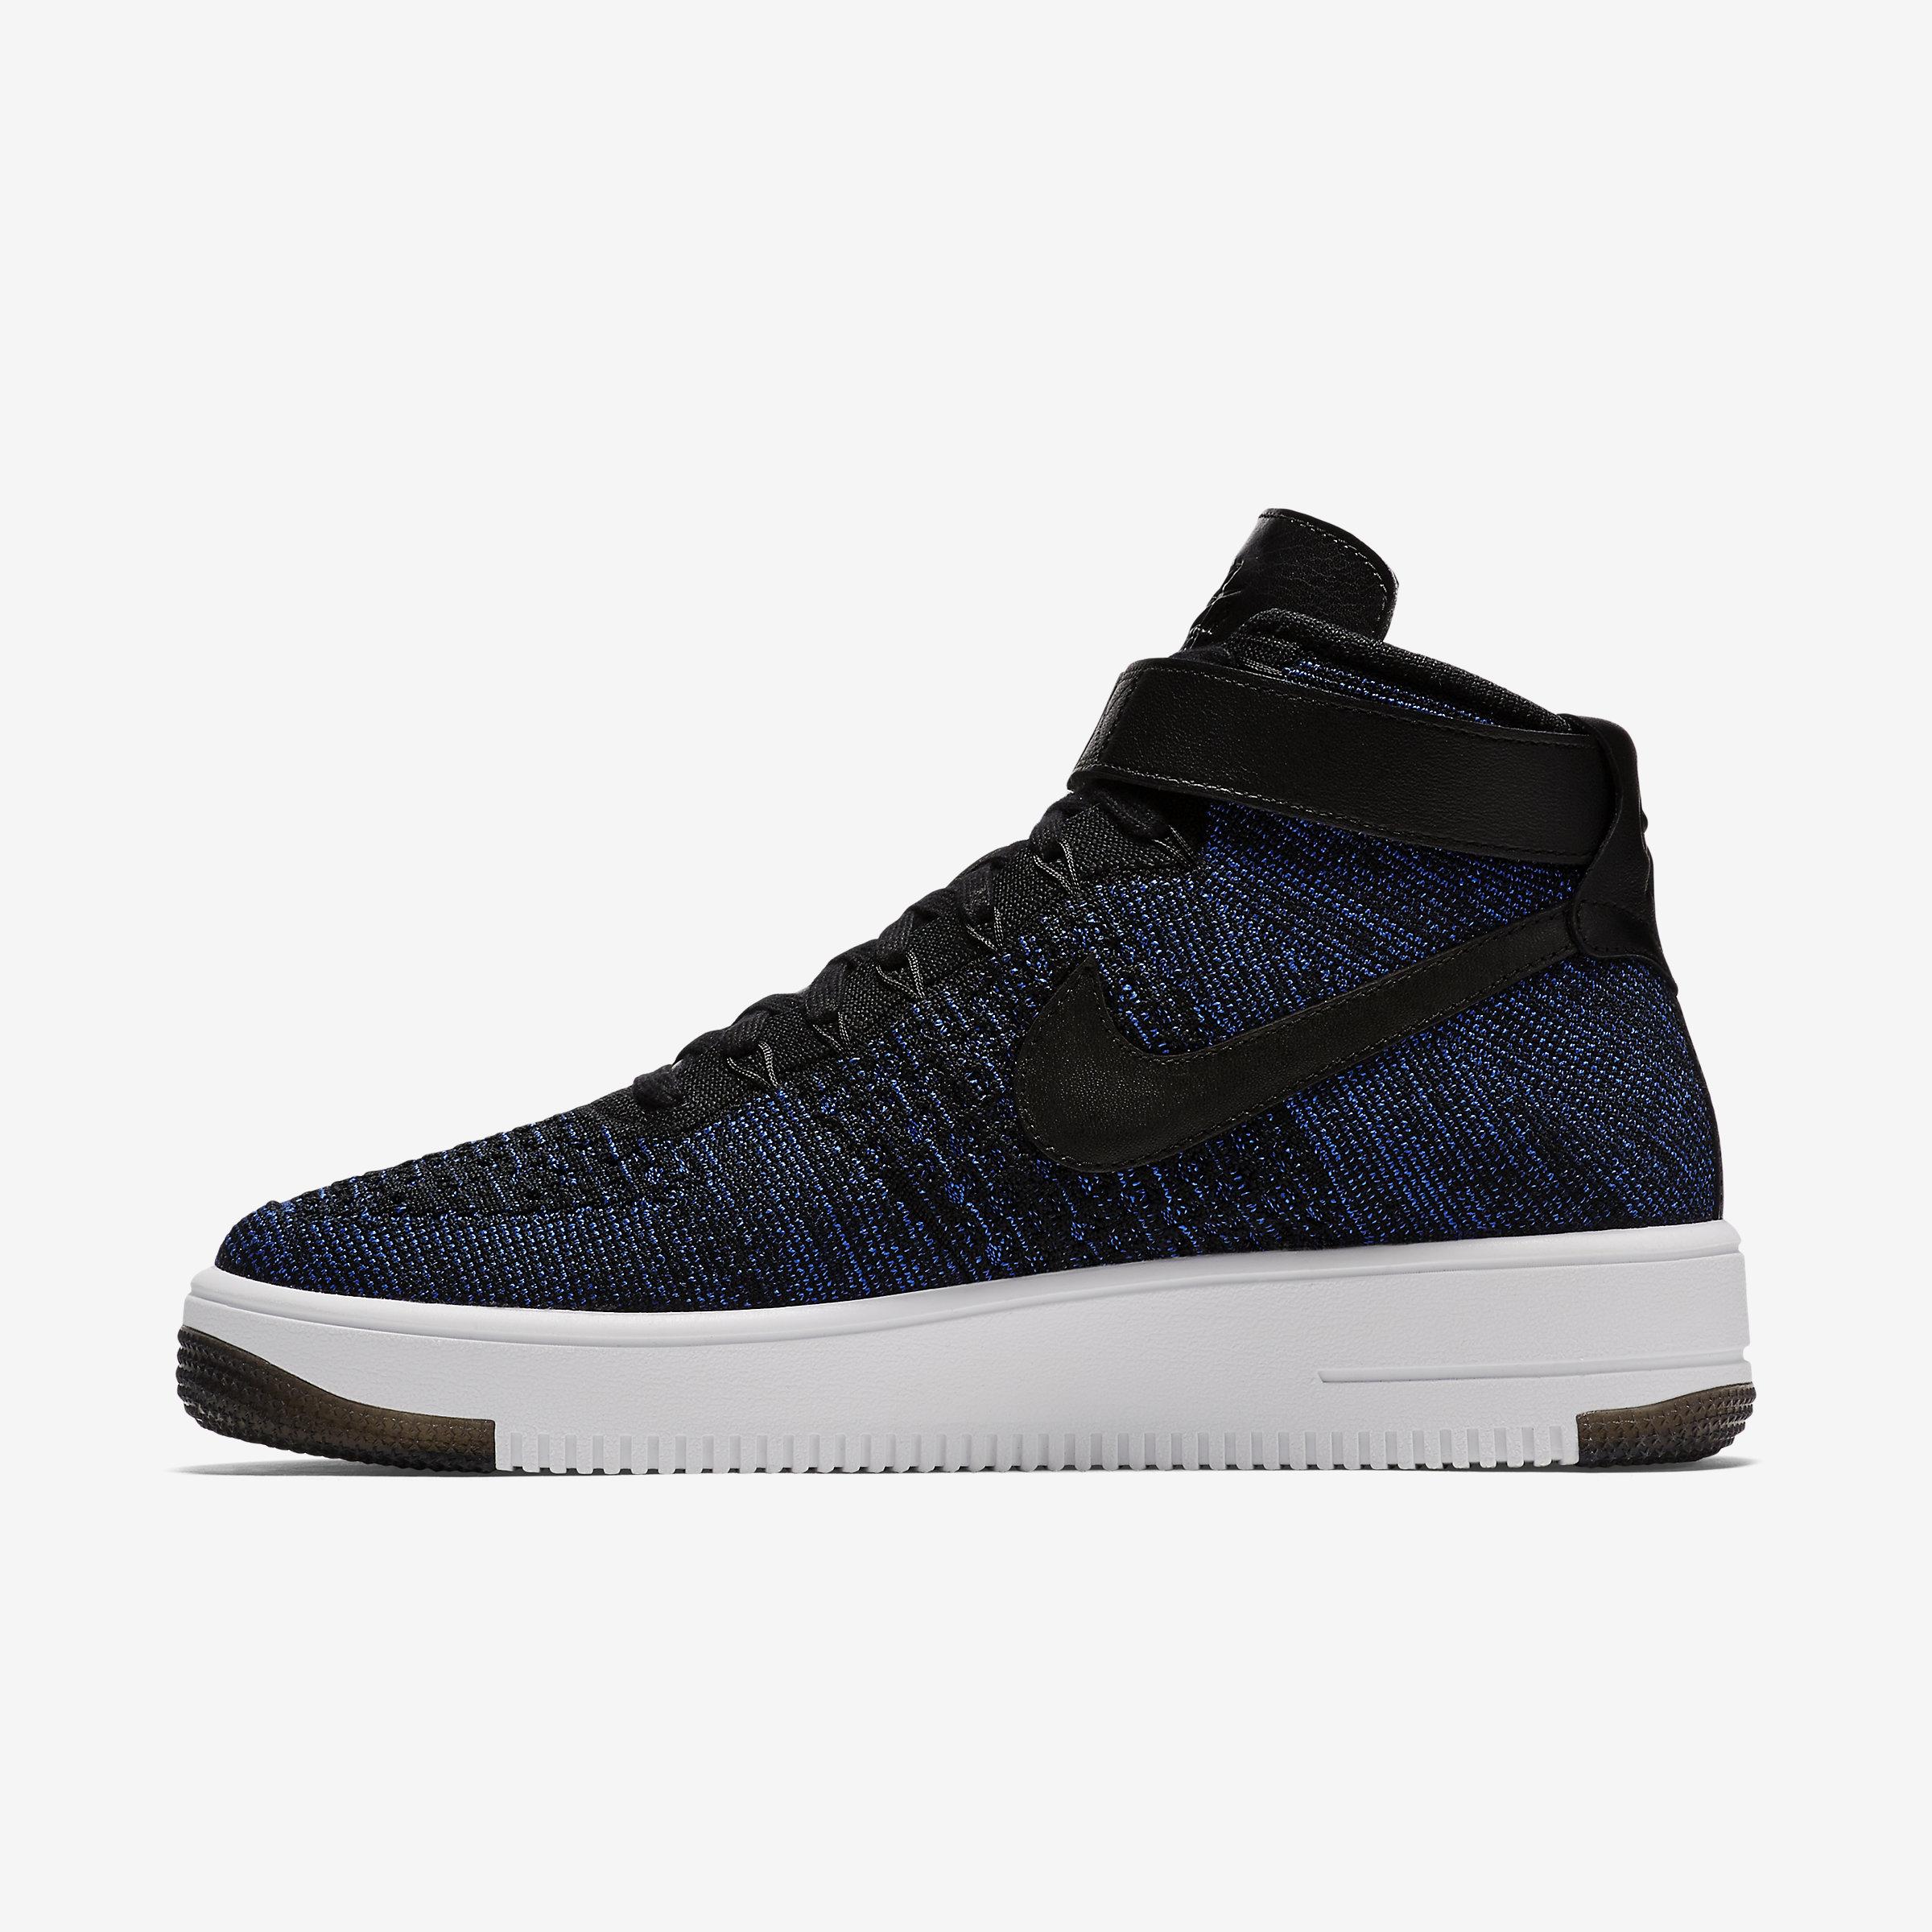 58387c3ca2d6 Nike Air Force 1 Ultra Flyknit in Black for Men - Lyst